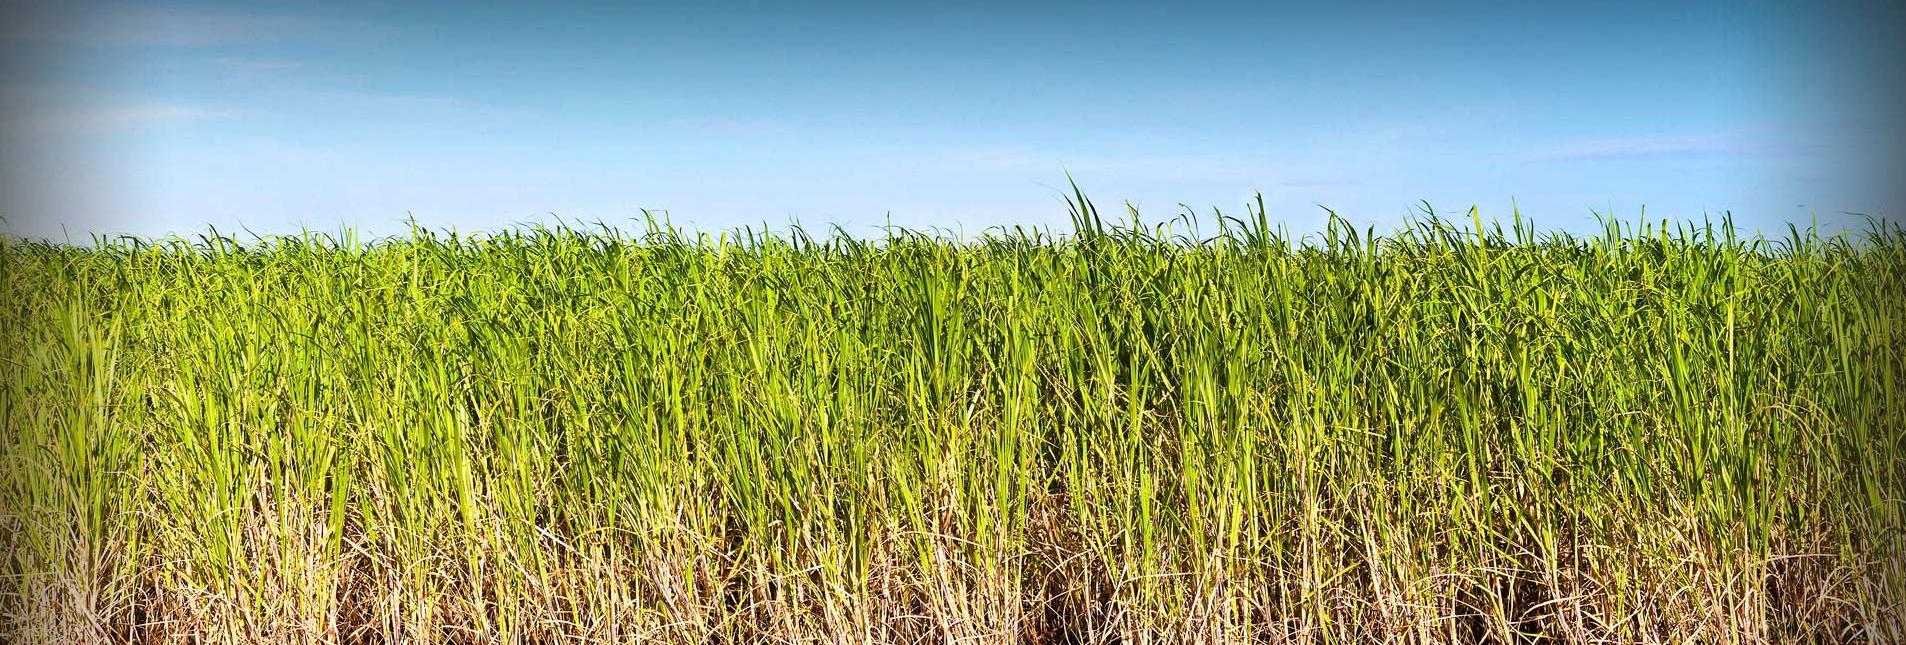 Sugarcane_trivia___interesting_sugar_cane___sugar-related_facts_medium